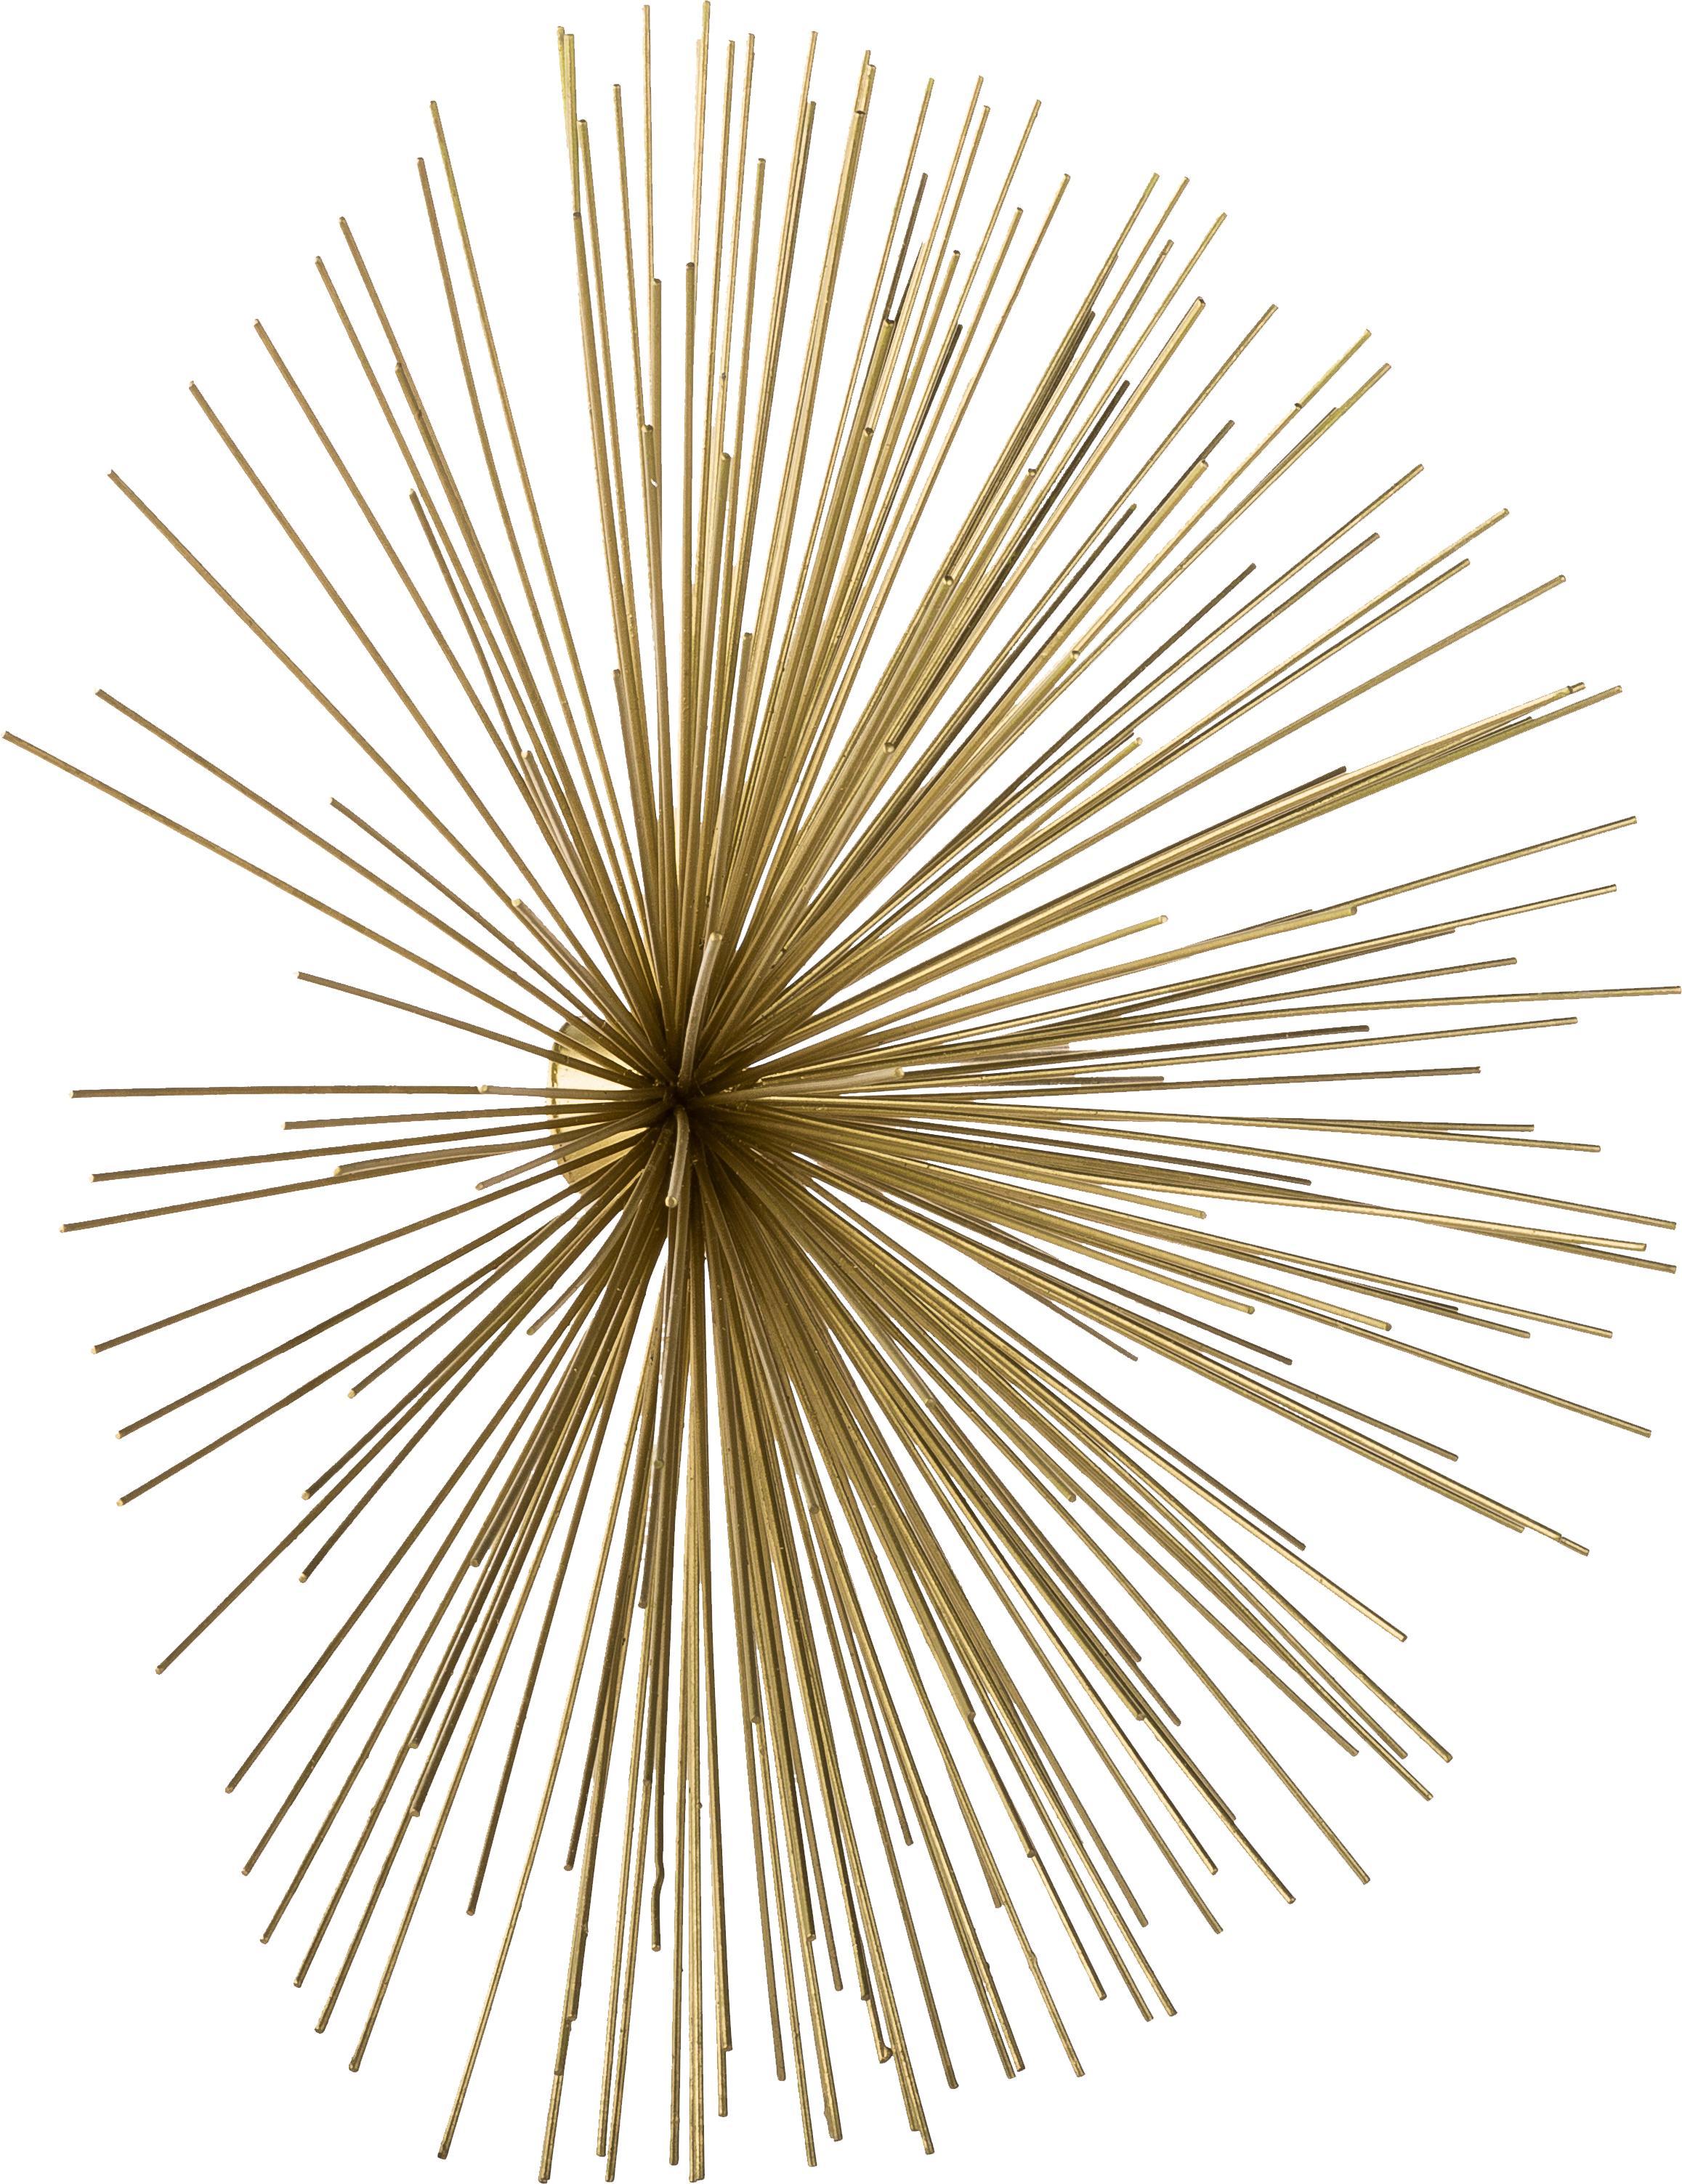 Wandobjekt-Set Ray aus Metall, 3-tlg., Metall, Goldfarben, Sondergrößen